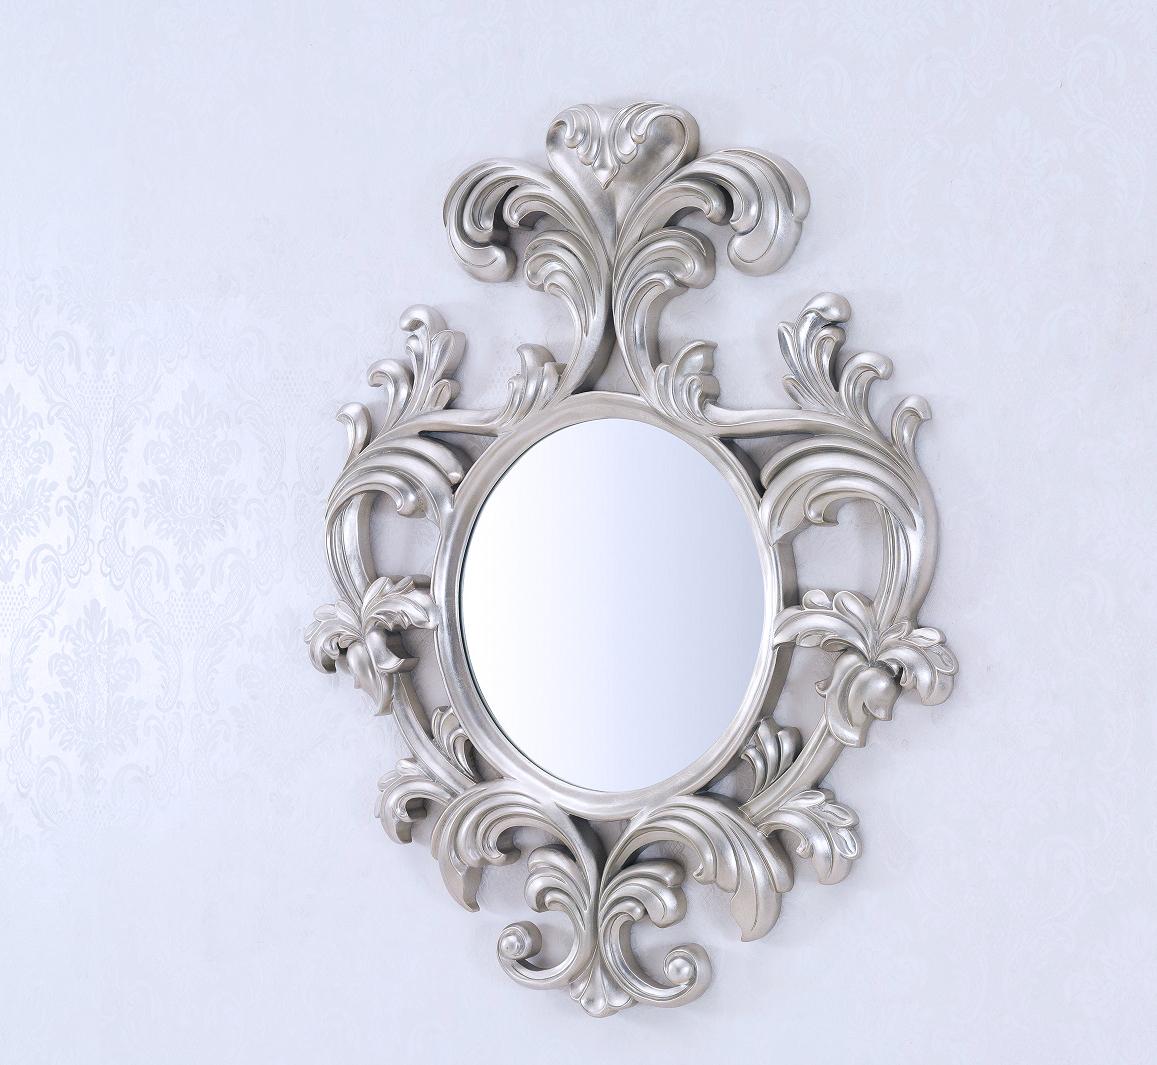 Decorative Wall Mirror – Geneve Silver Throughout Popular Small Decorative Wall Mirrors (View 4 of 20)